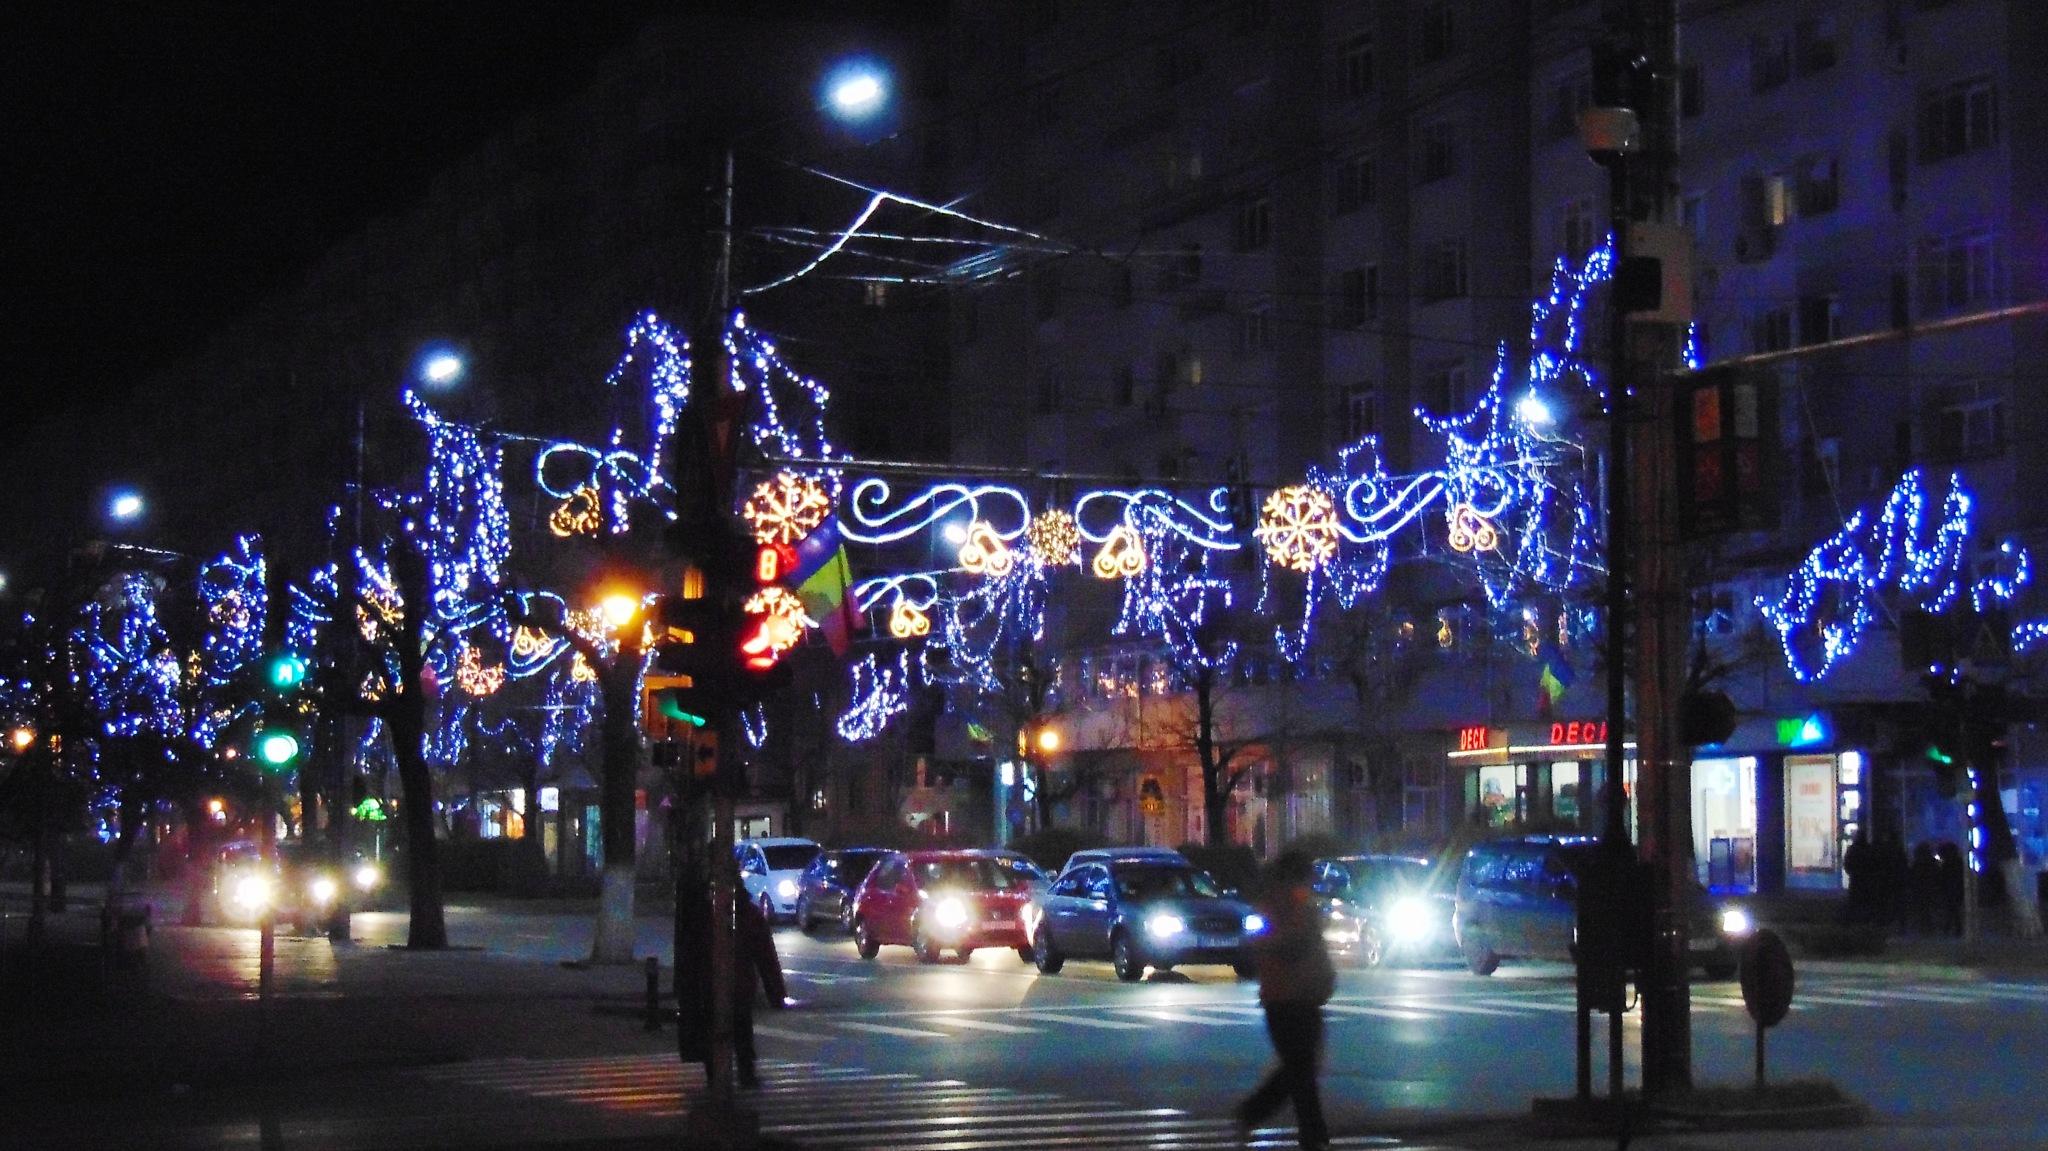 Christmas spirit by RoBeRt